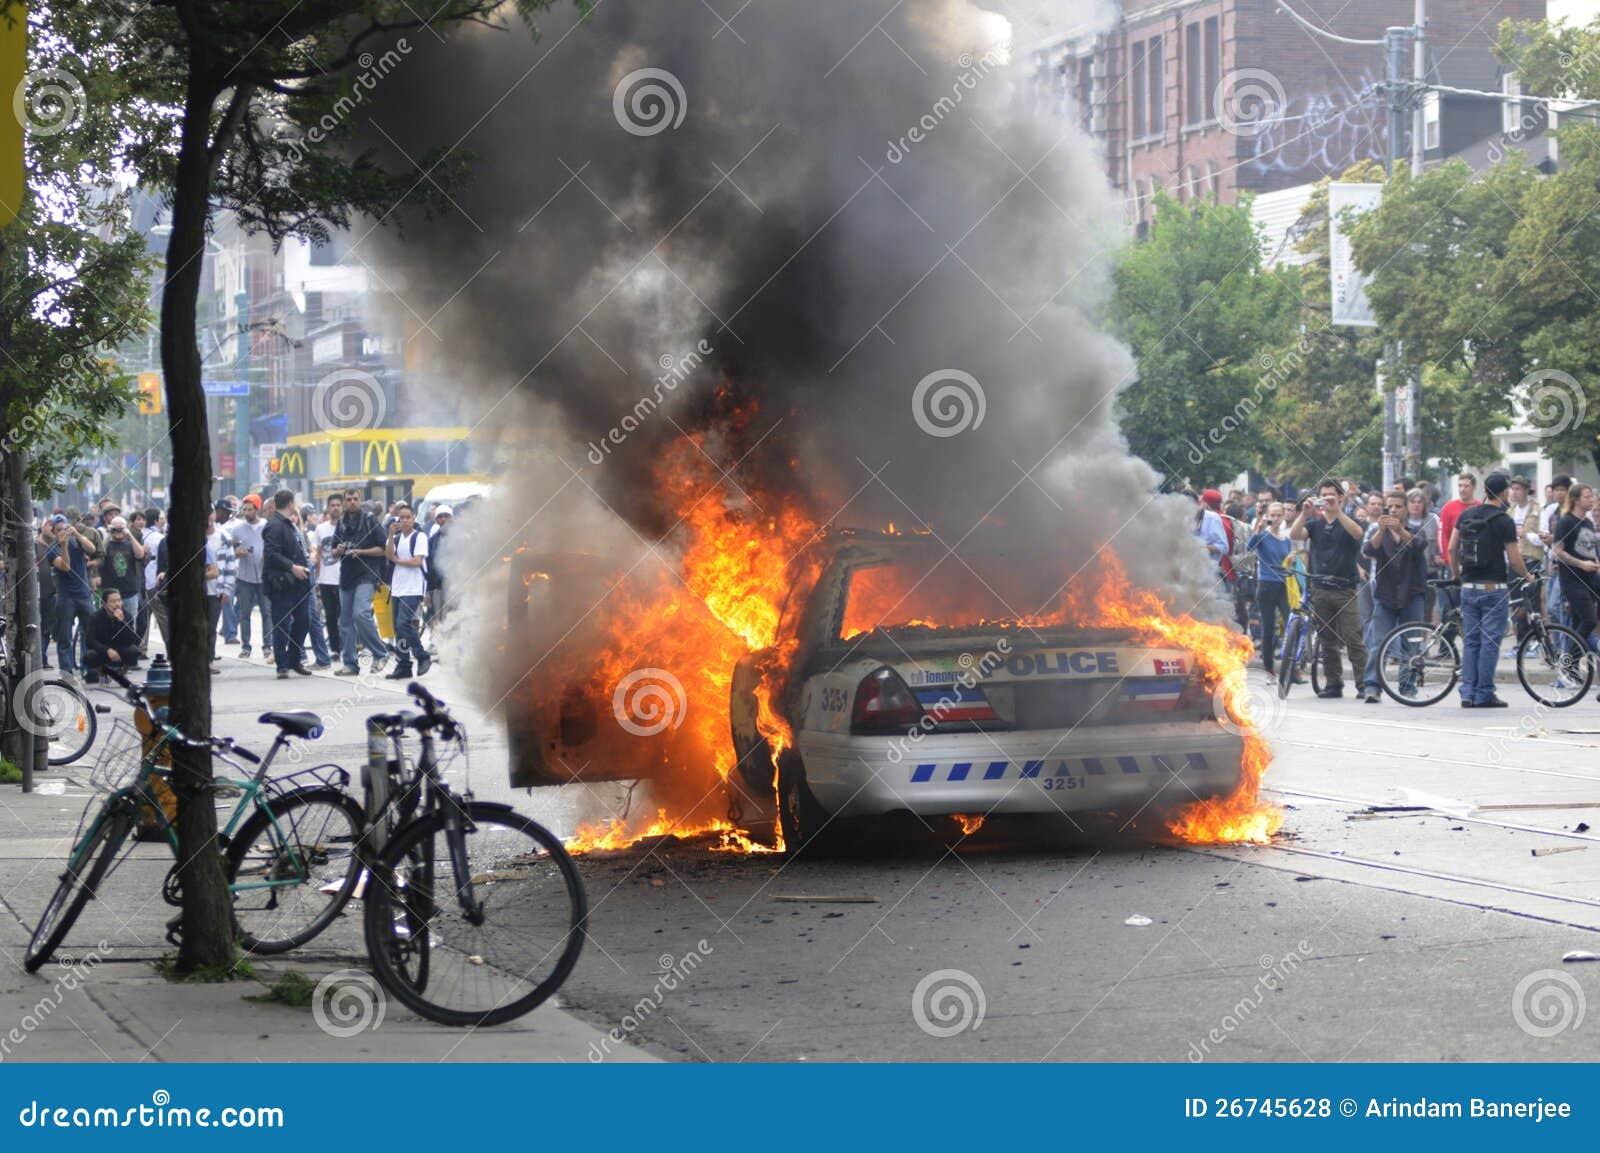 Véhicule de police brûlant.